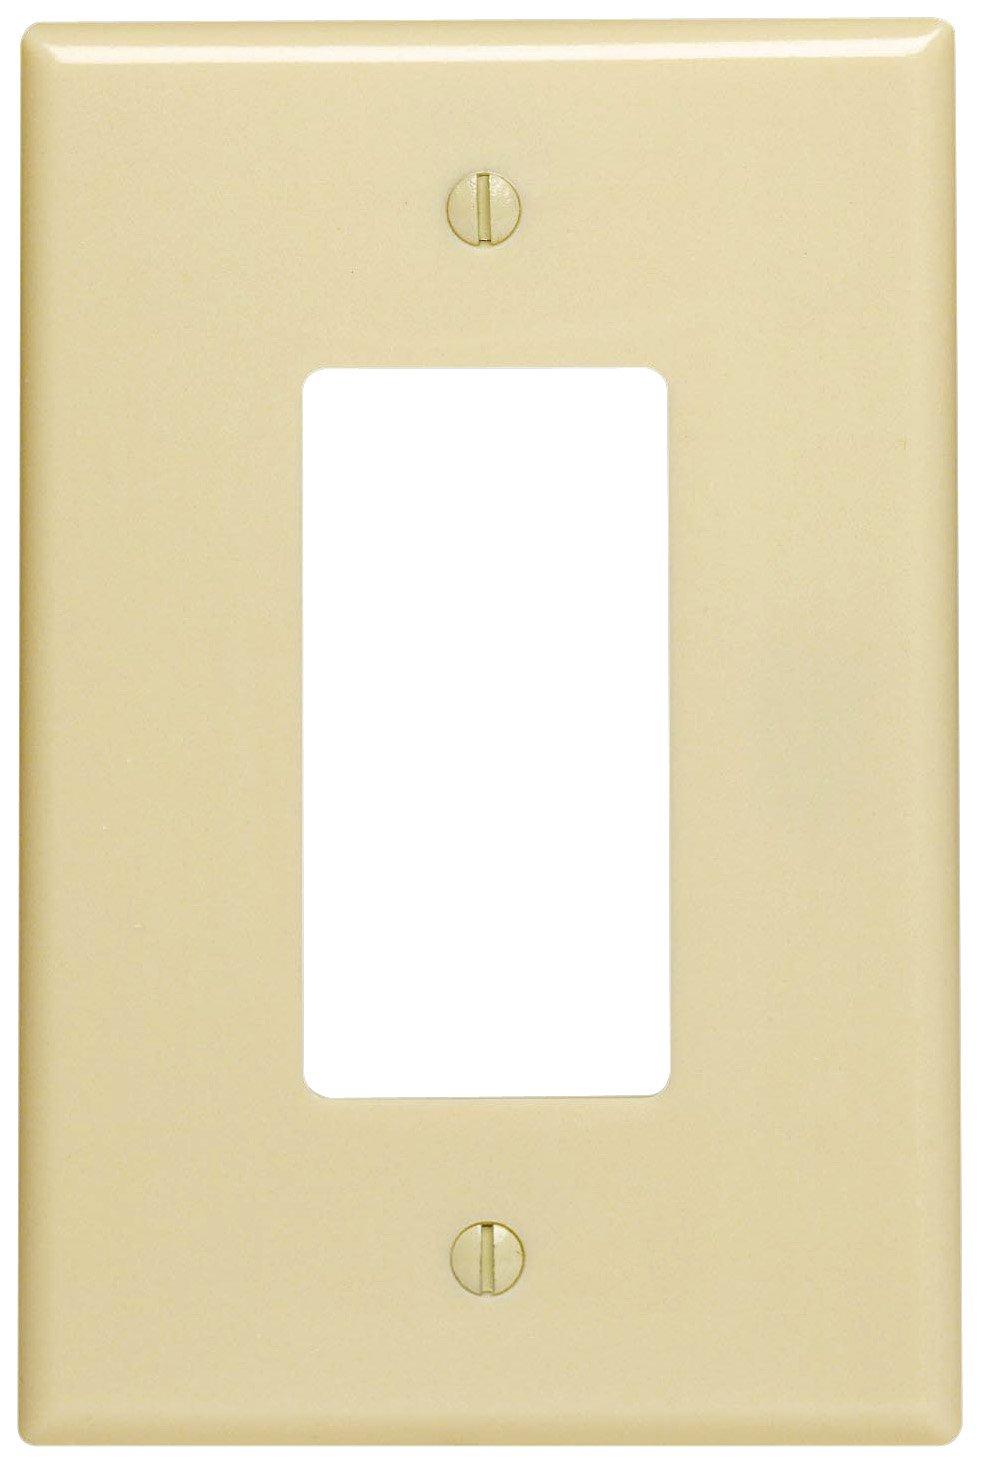 Leviton 86601 1-Gang Decora/GFCI Device Wallplate, Oversized ...